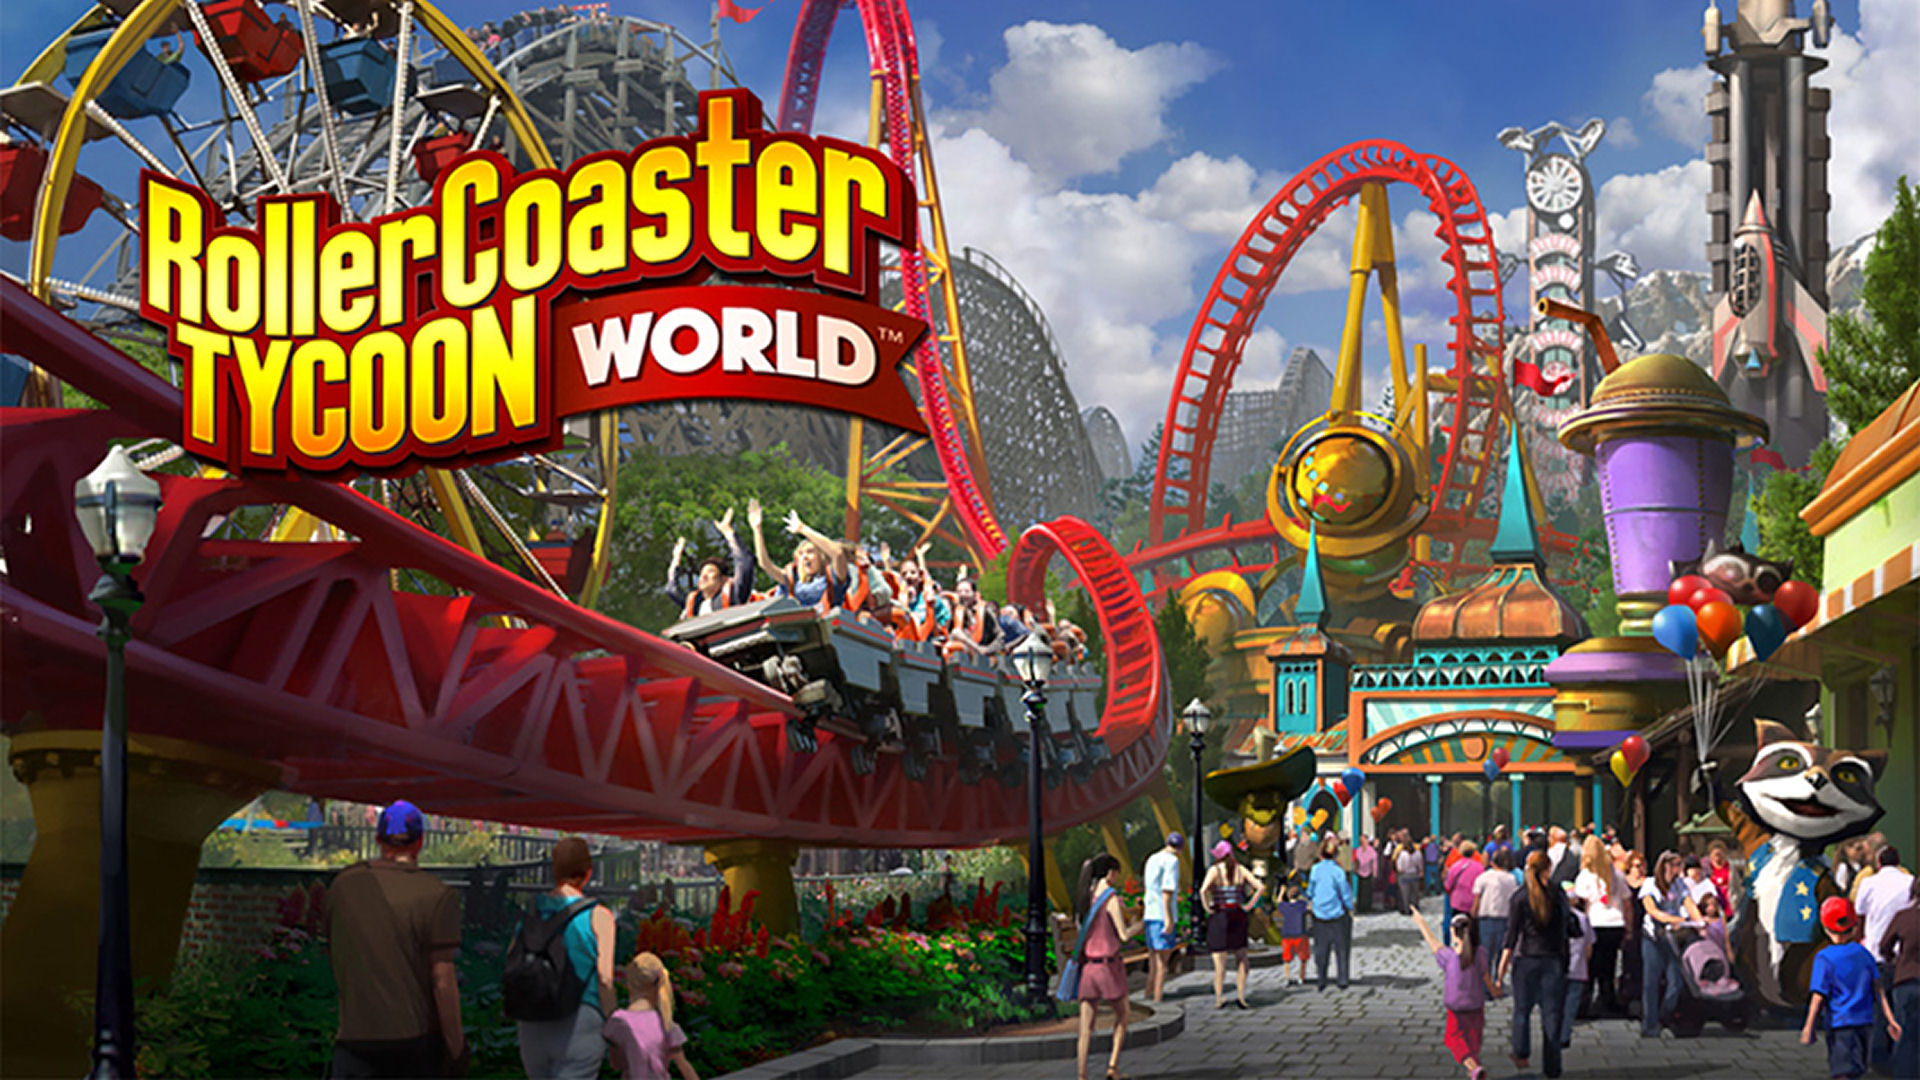 RollerCoaster Tycoon World Free Download - CroHasIt